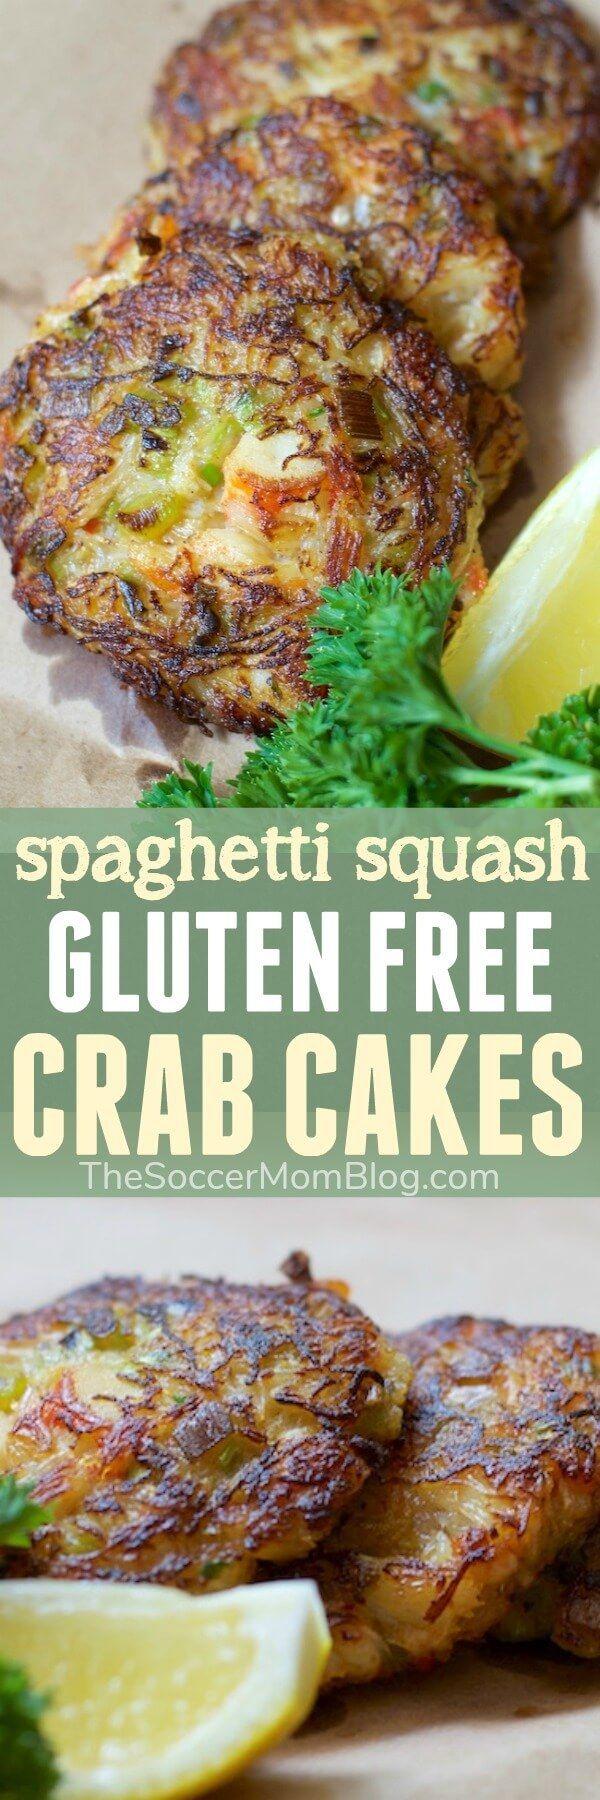 Best 25+ Gluten free crab cakes ideas on Pinterest ...